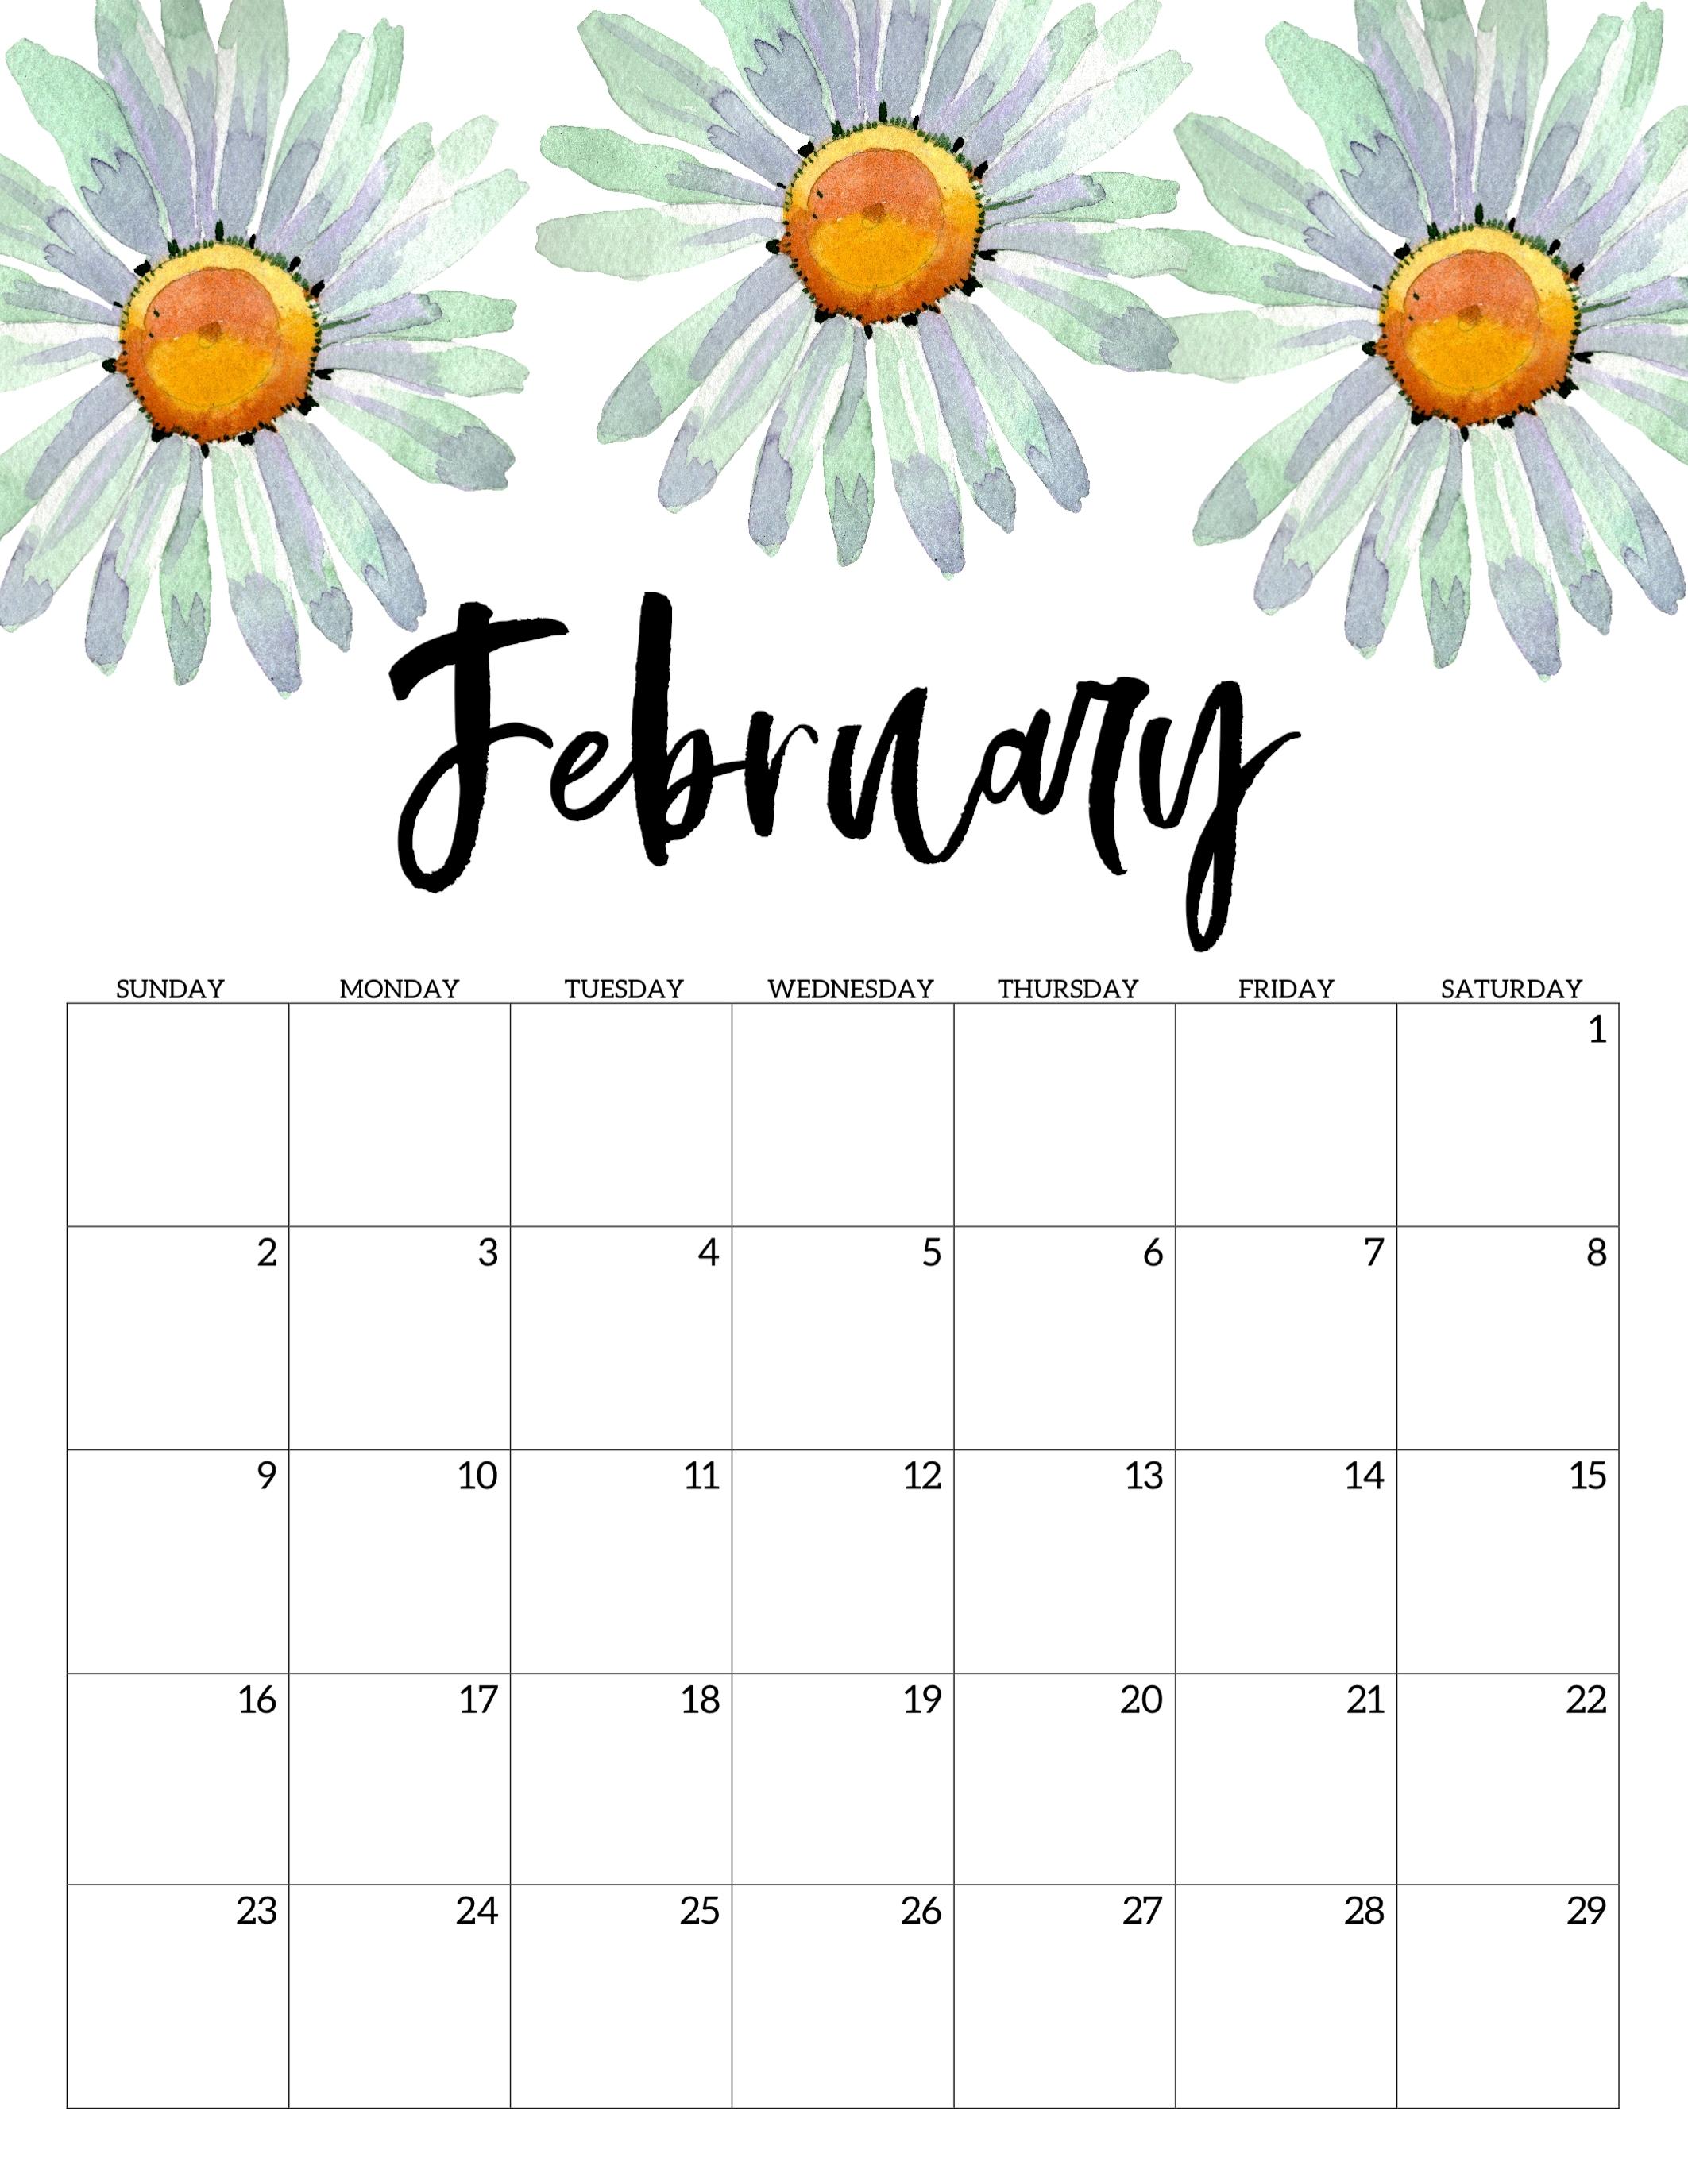 2020 Free Printable Calendar - Floral - Paper Trail Design